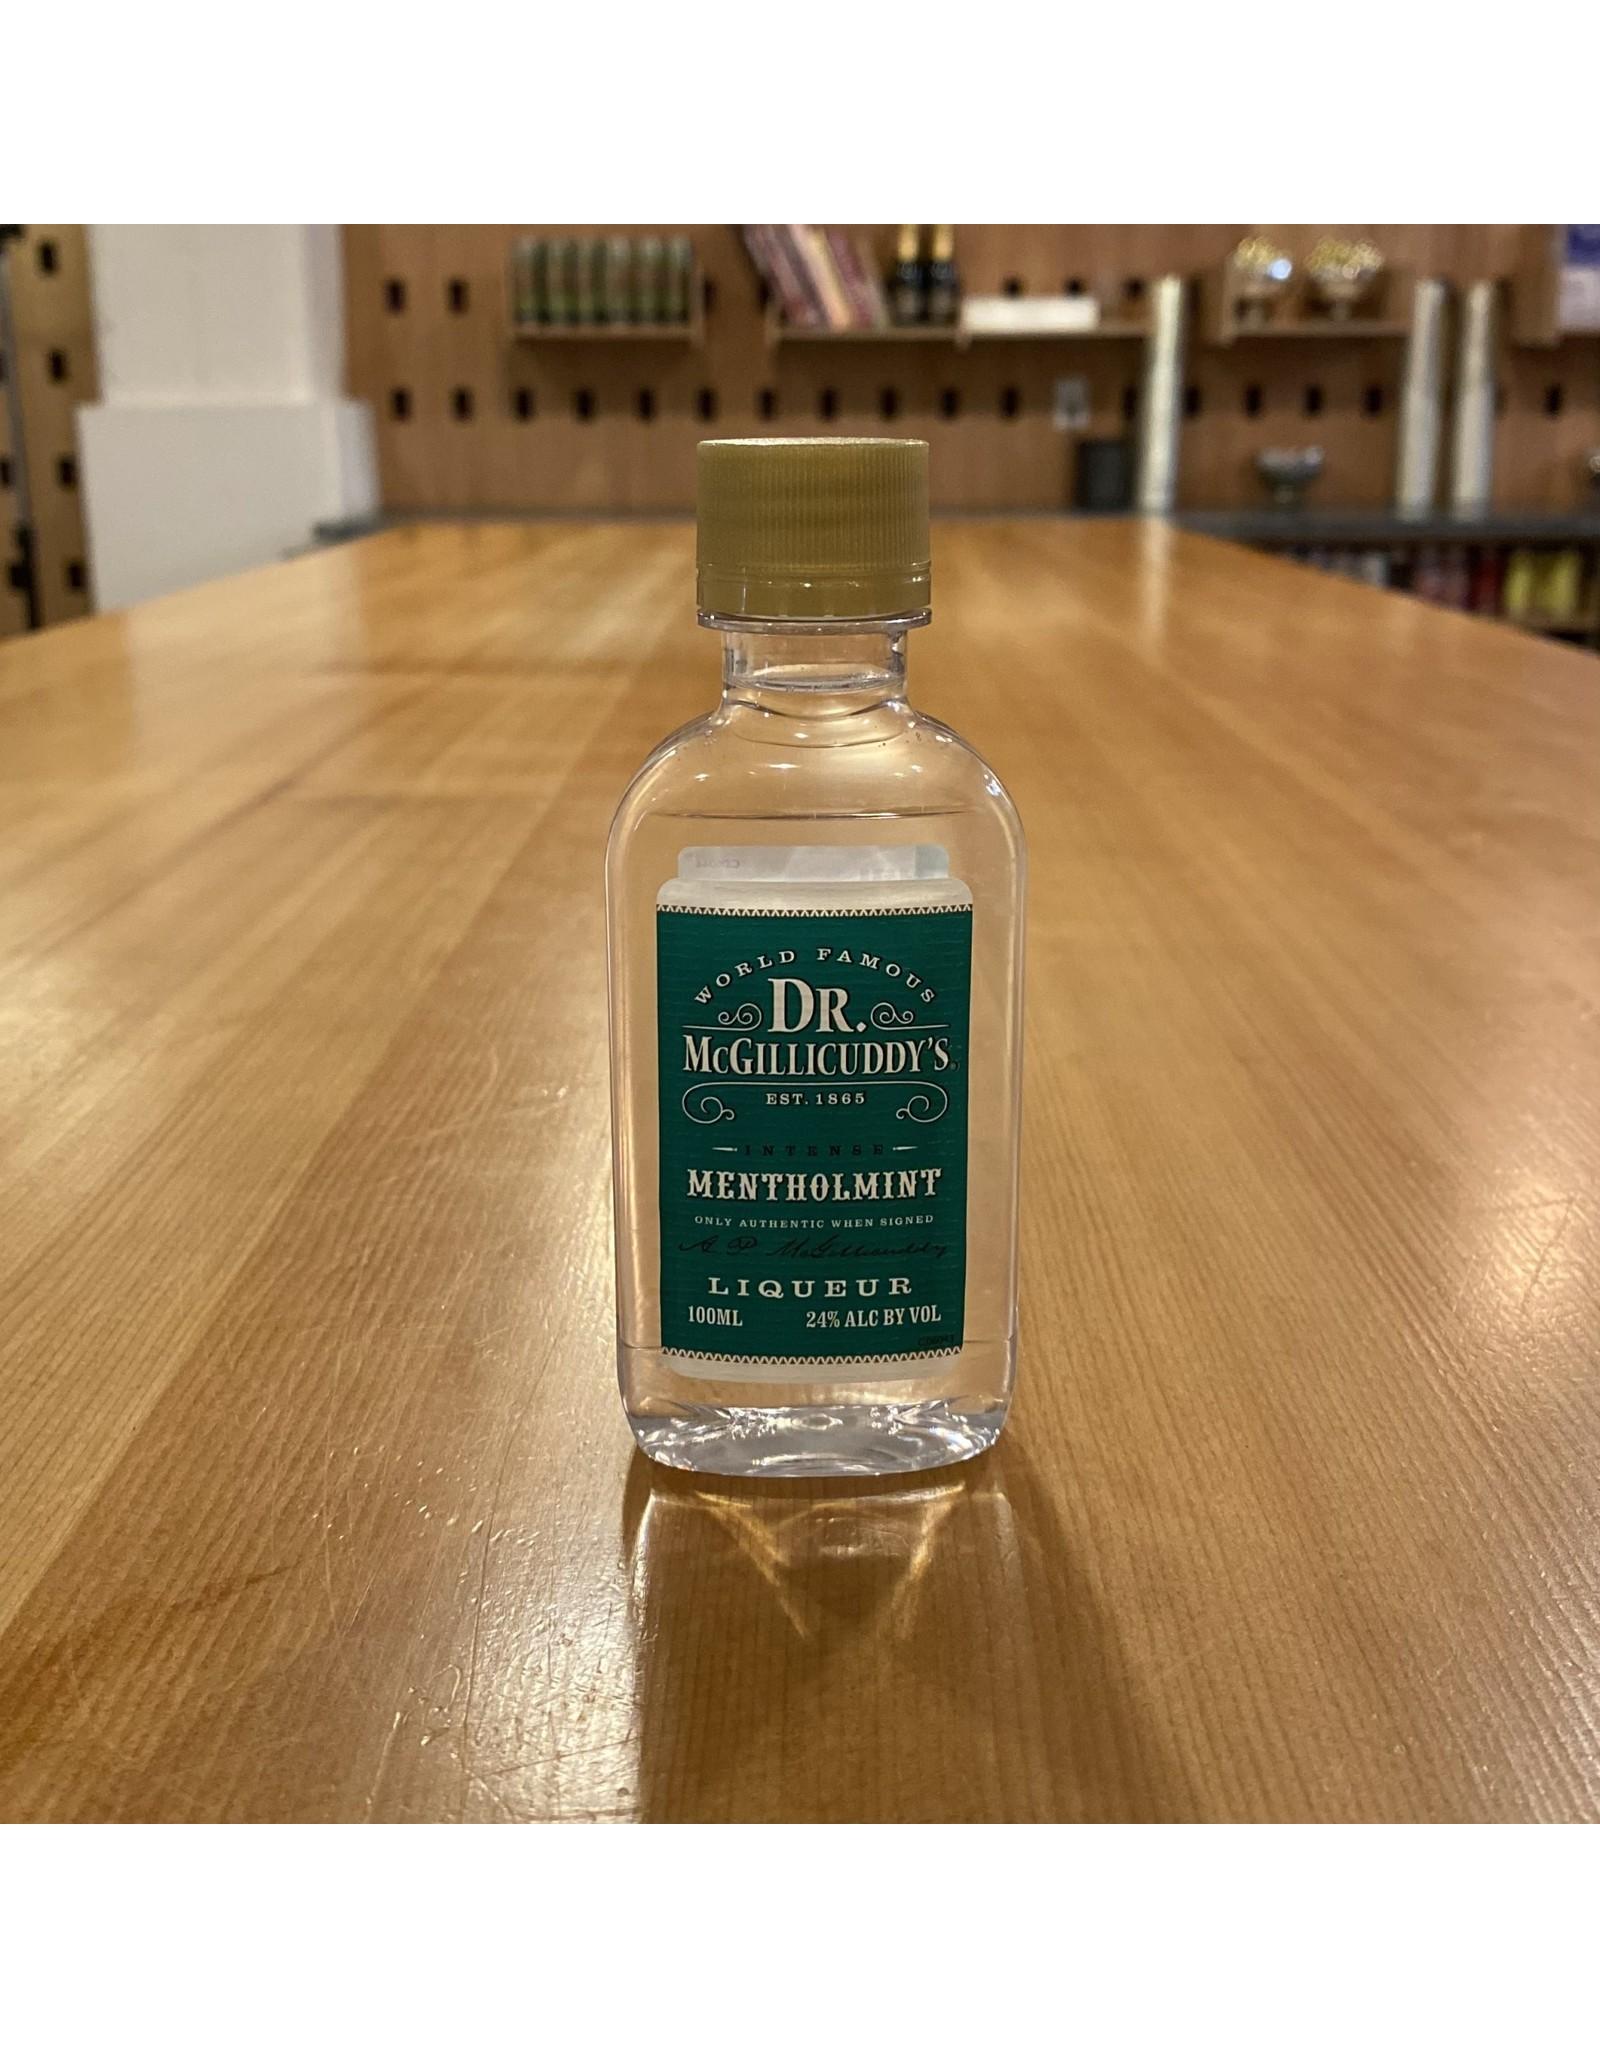 Dr McGillicuddy's Mentholmint Liqueur 100ml - Kentucky